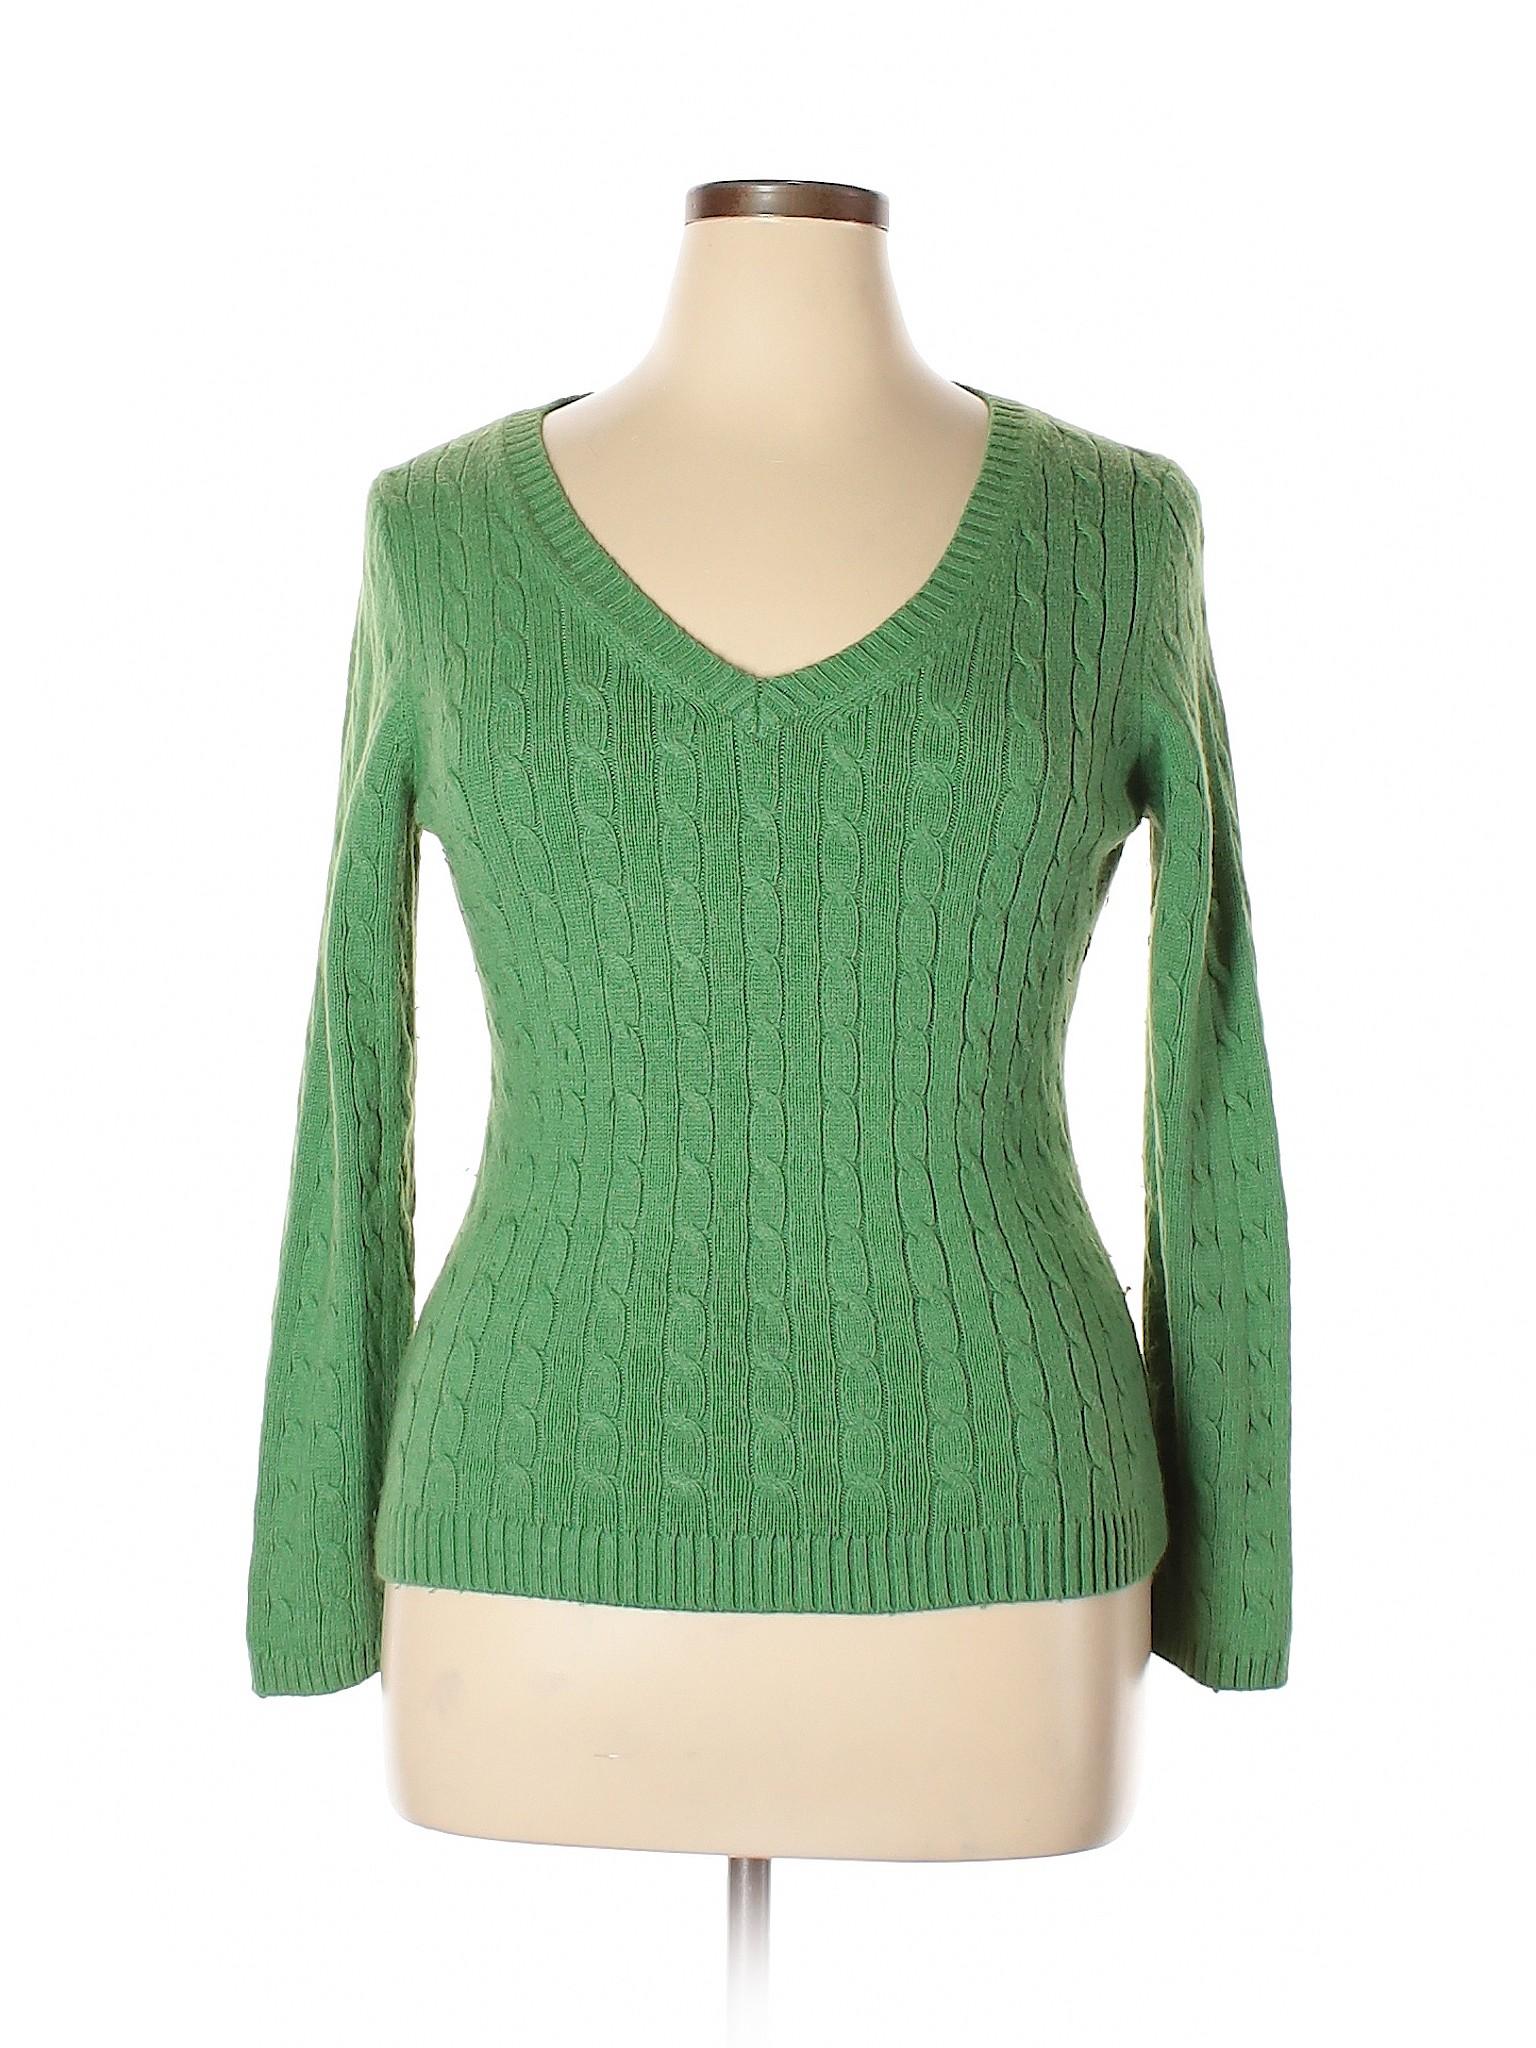 Boutique Sweater Pullover Ann Taylor LOFT BXWqRrX